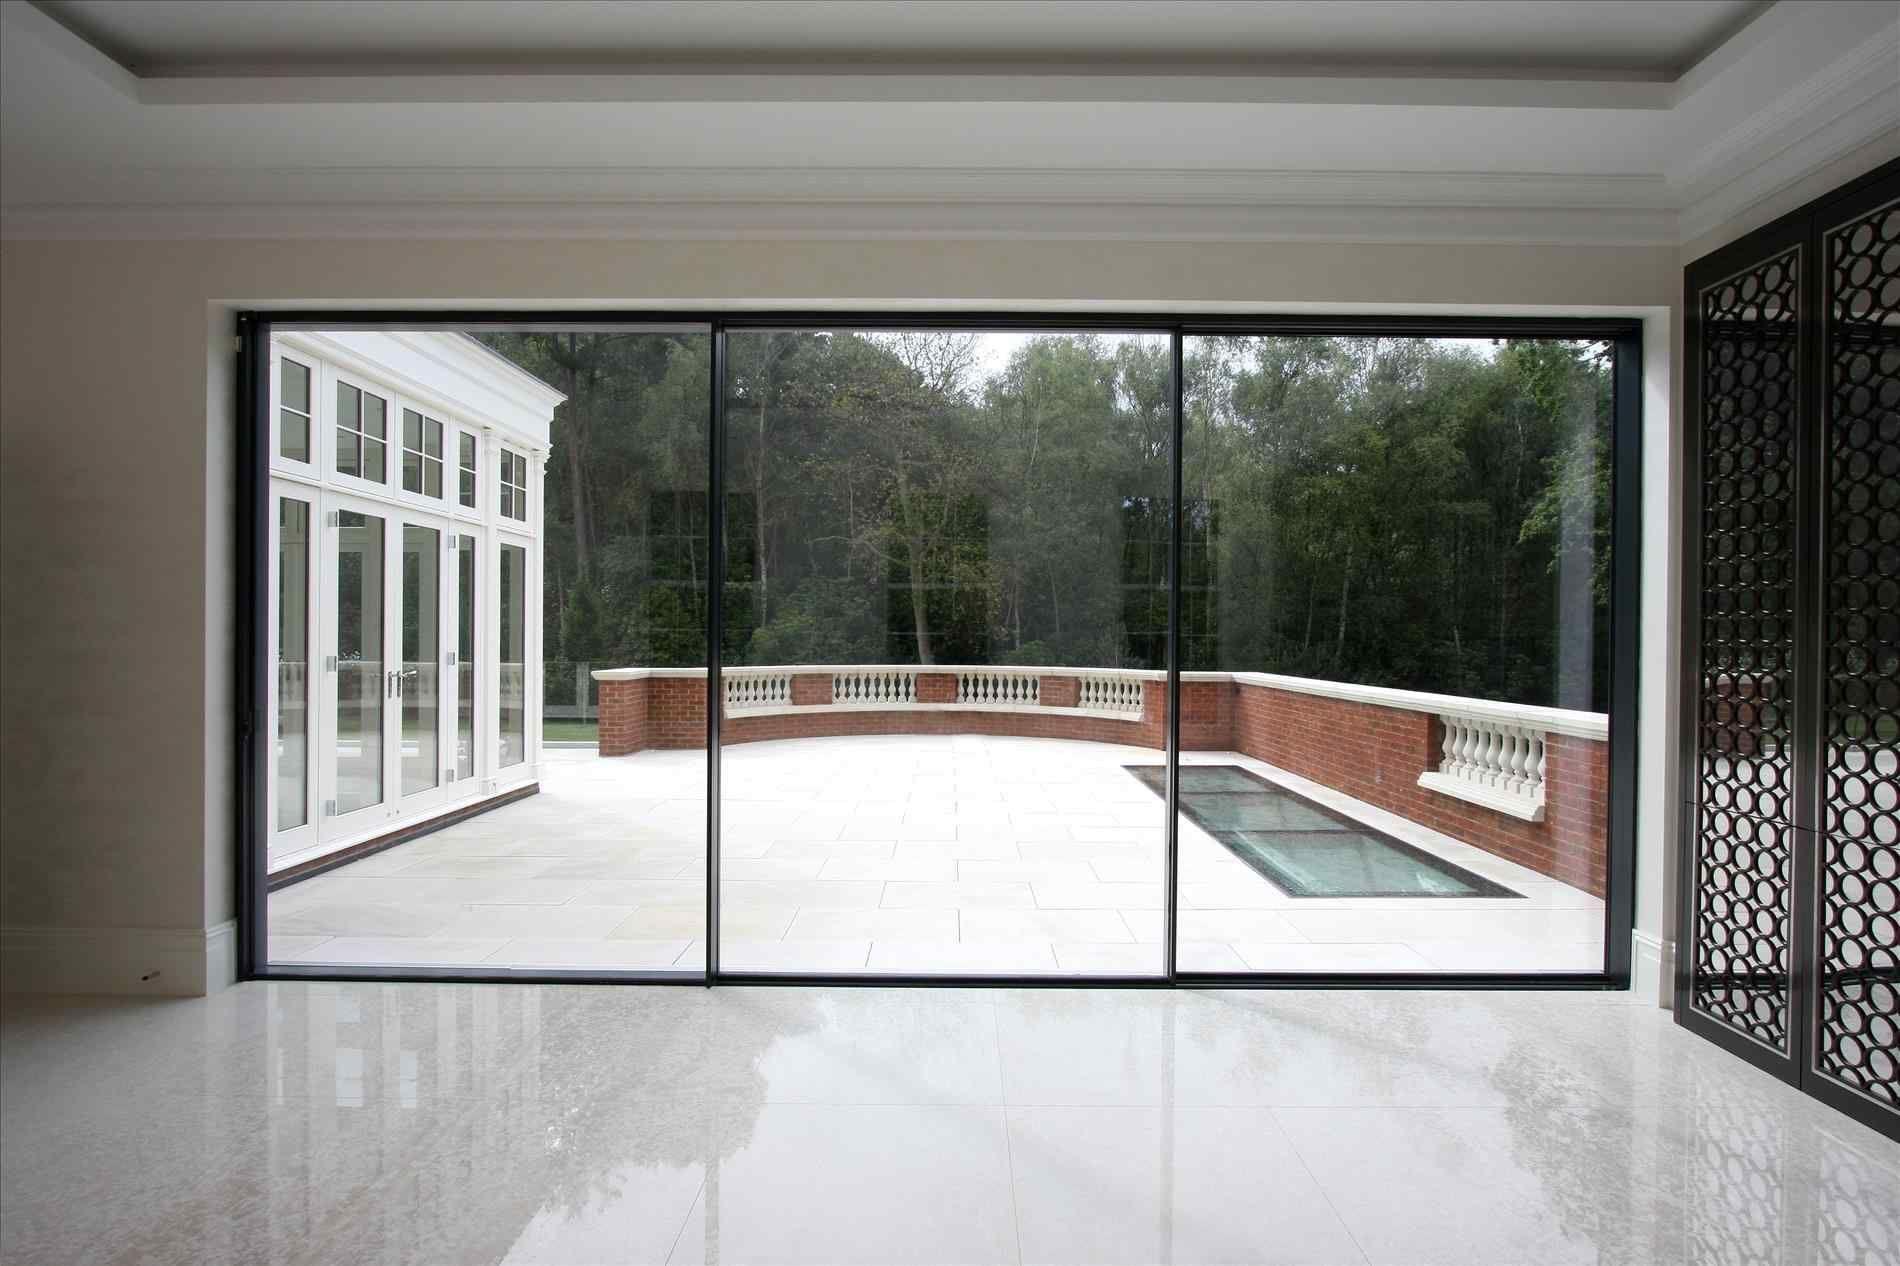 Luxurious Style Mybktouchcom Patio Door Btcainfo Examples Designs